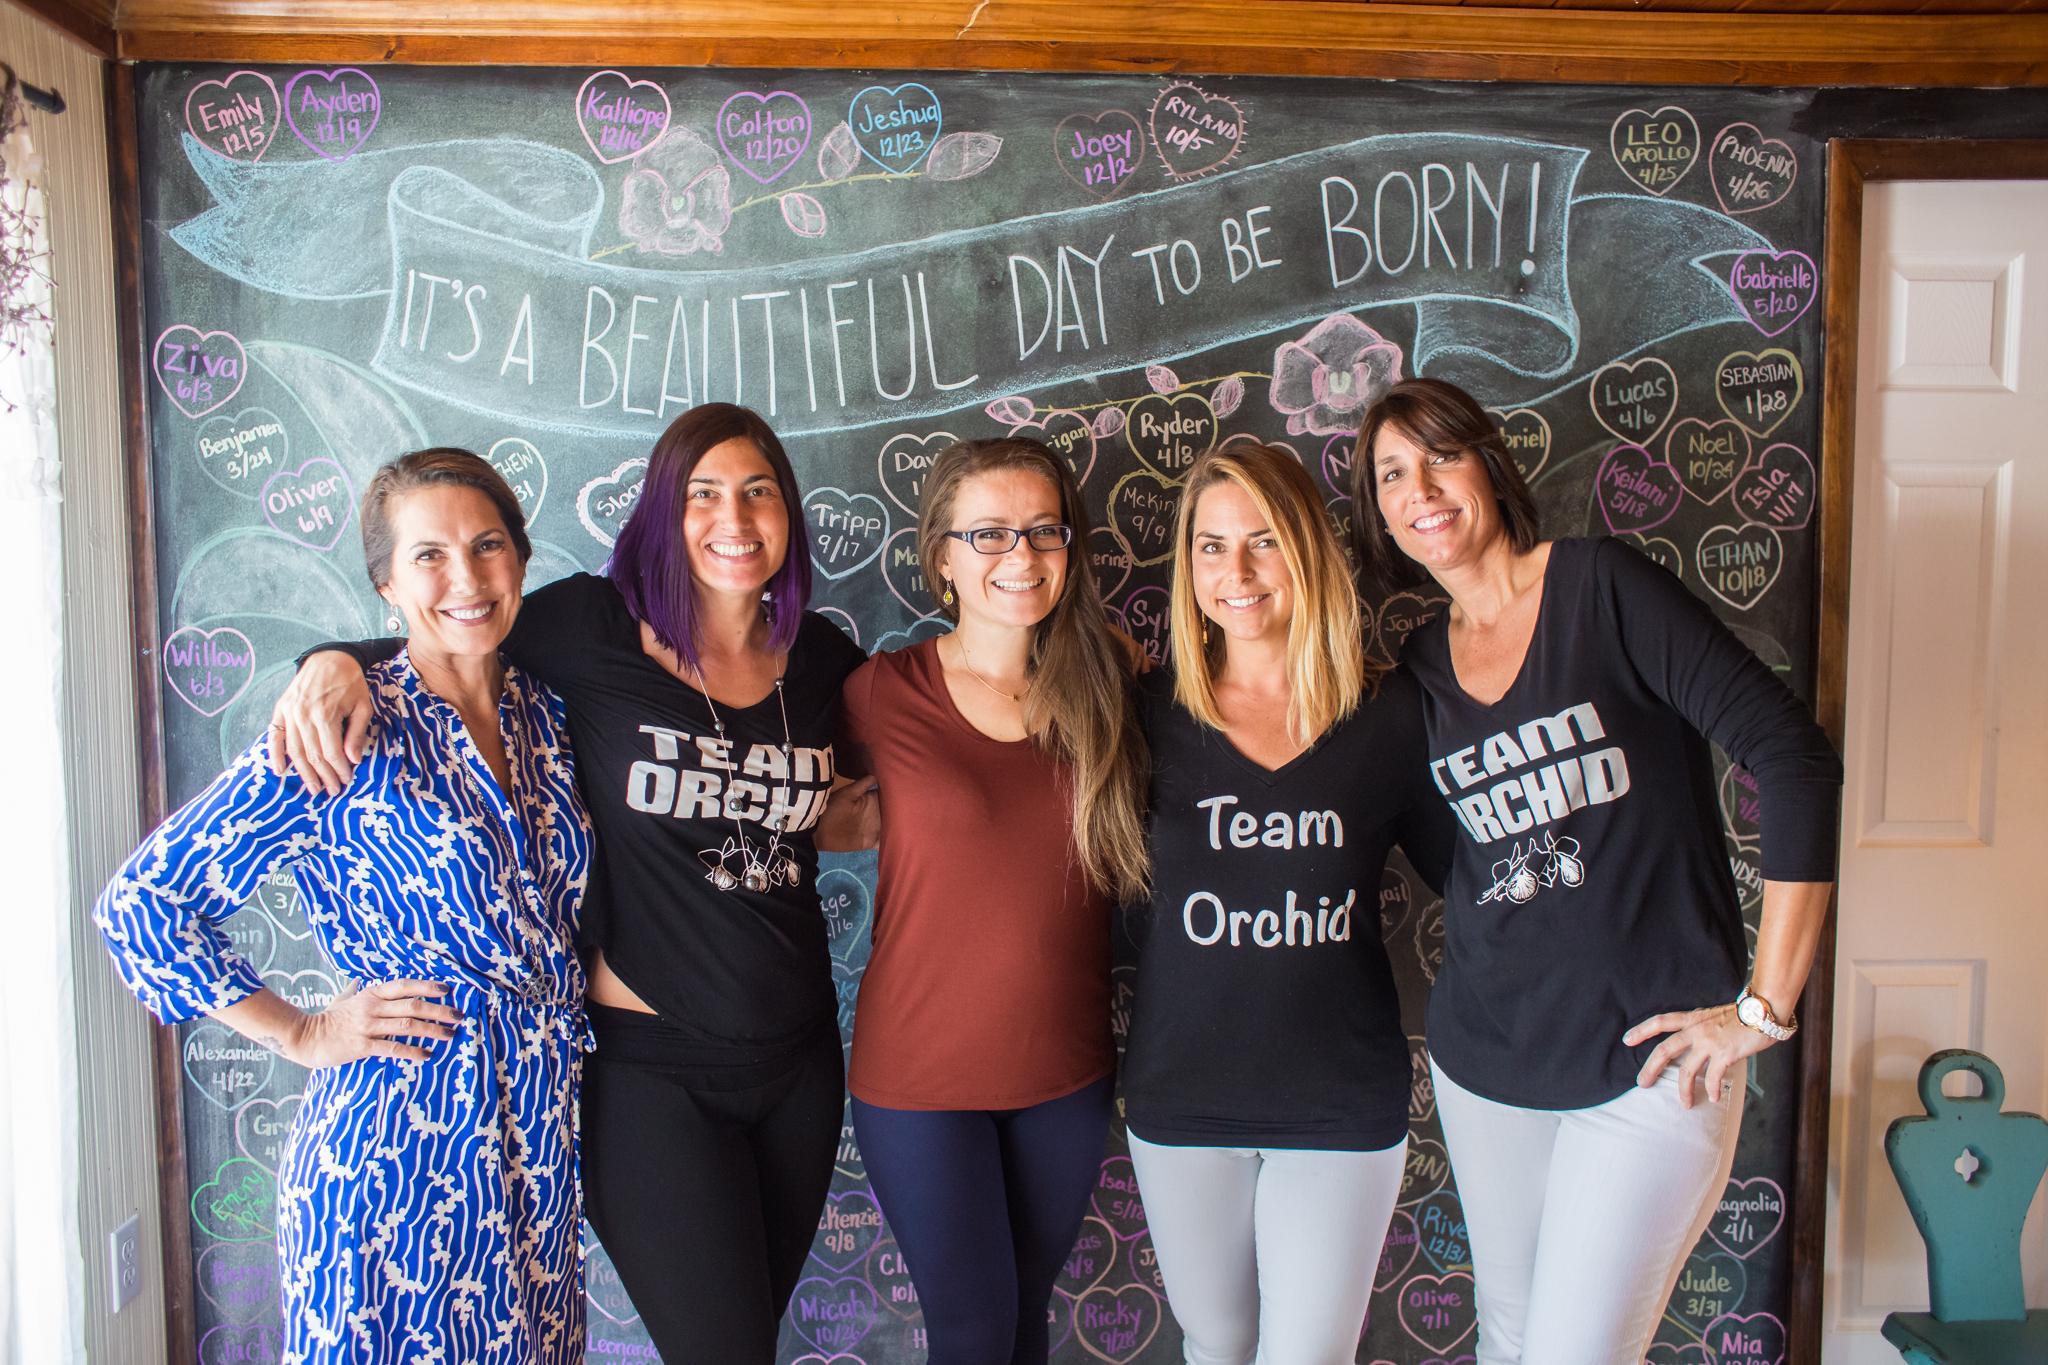 (left to right) doulas Lorie McCoy, Arian Englesson, birth photographer Paulina Splechta, doula Samara Andreadis, doula Delainey Casey